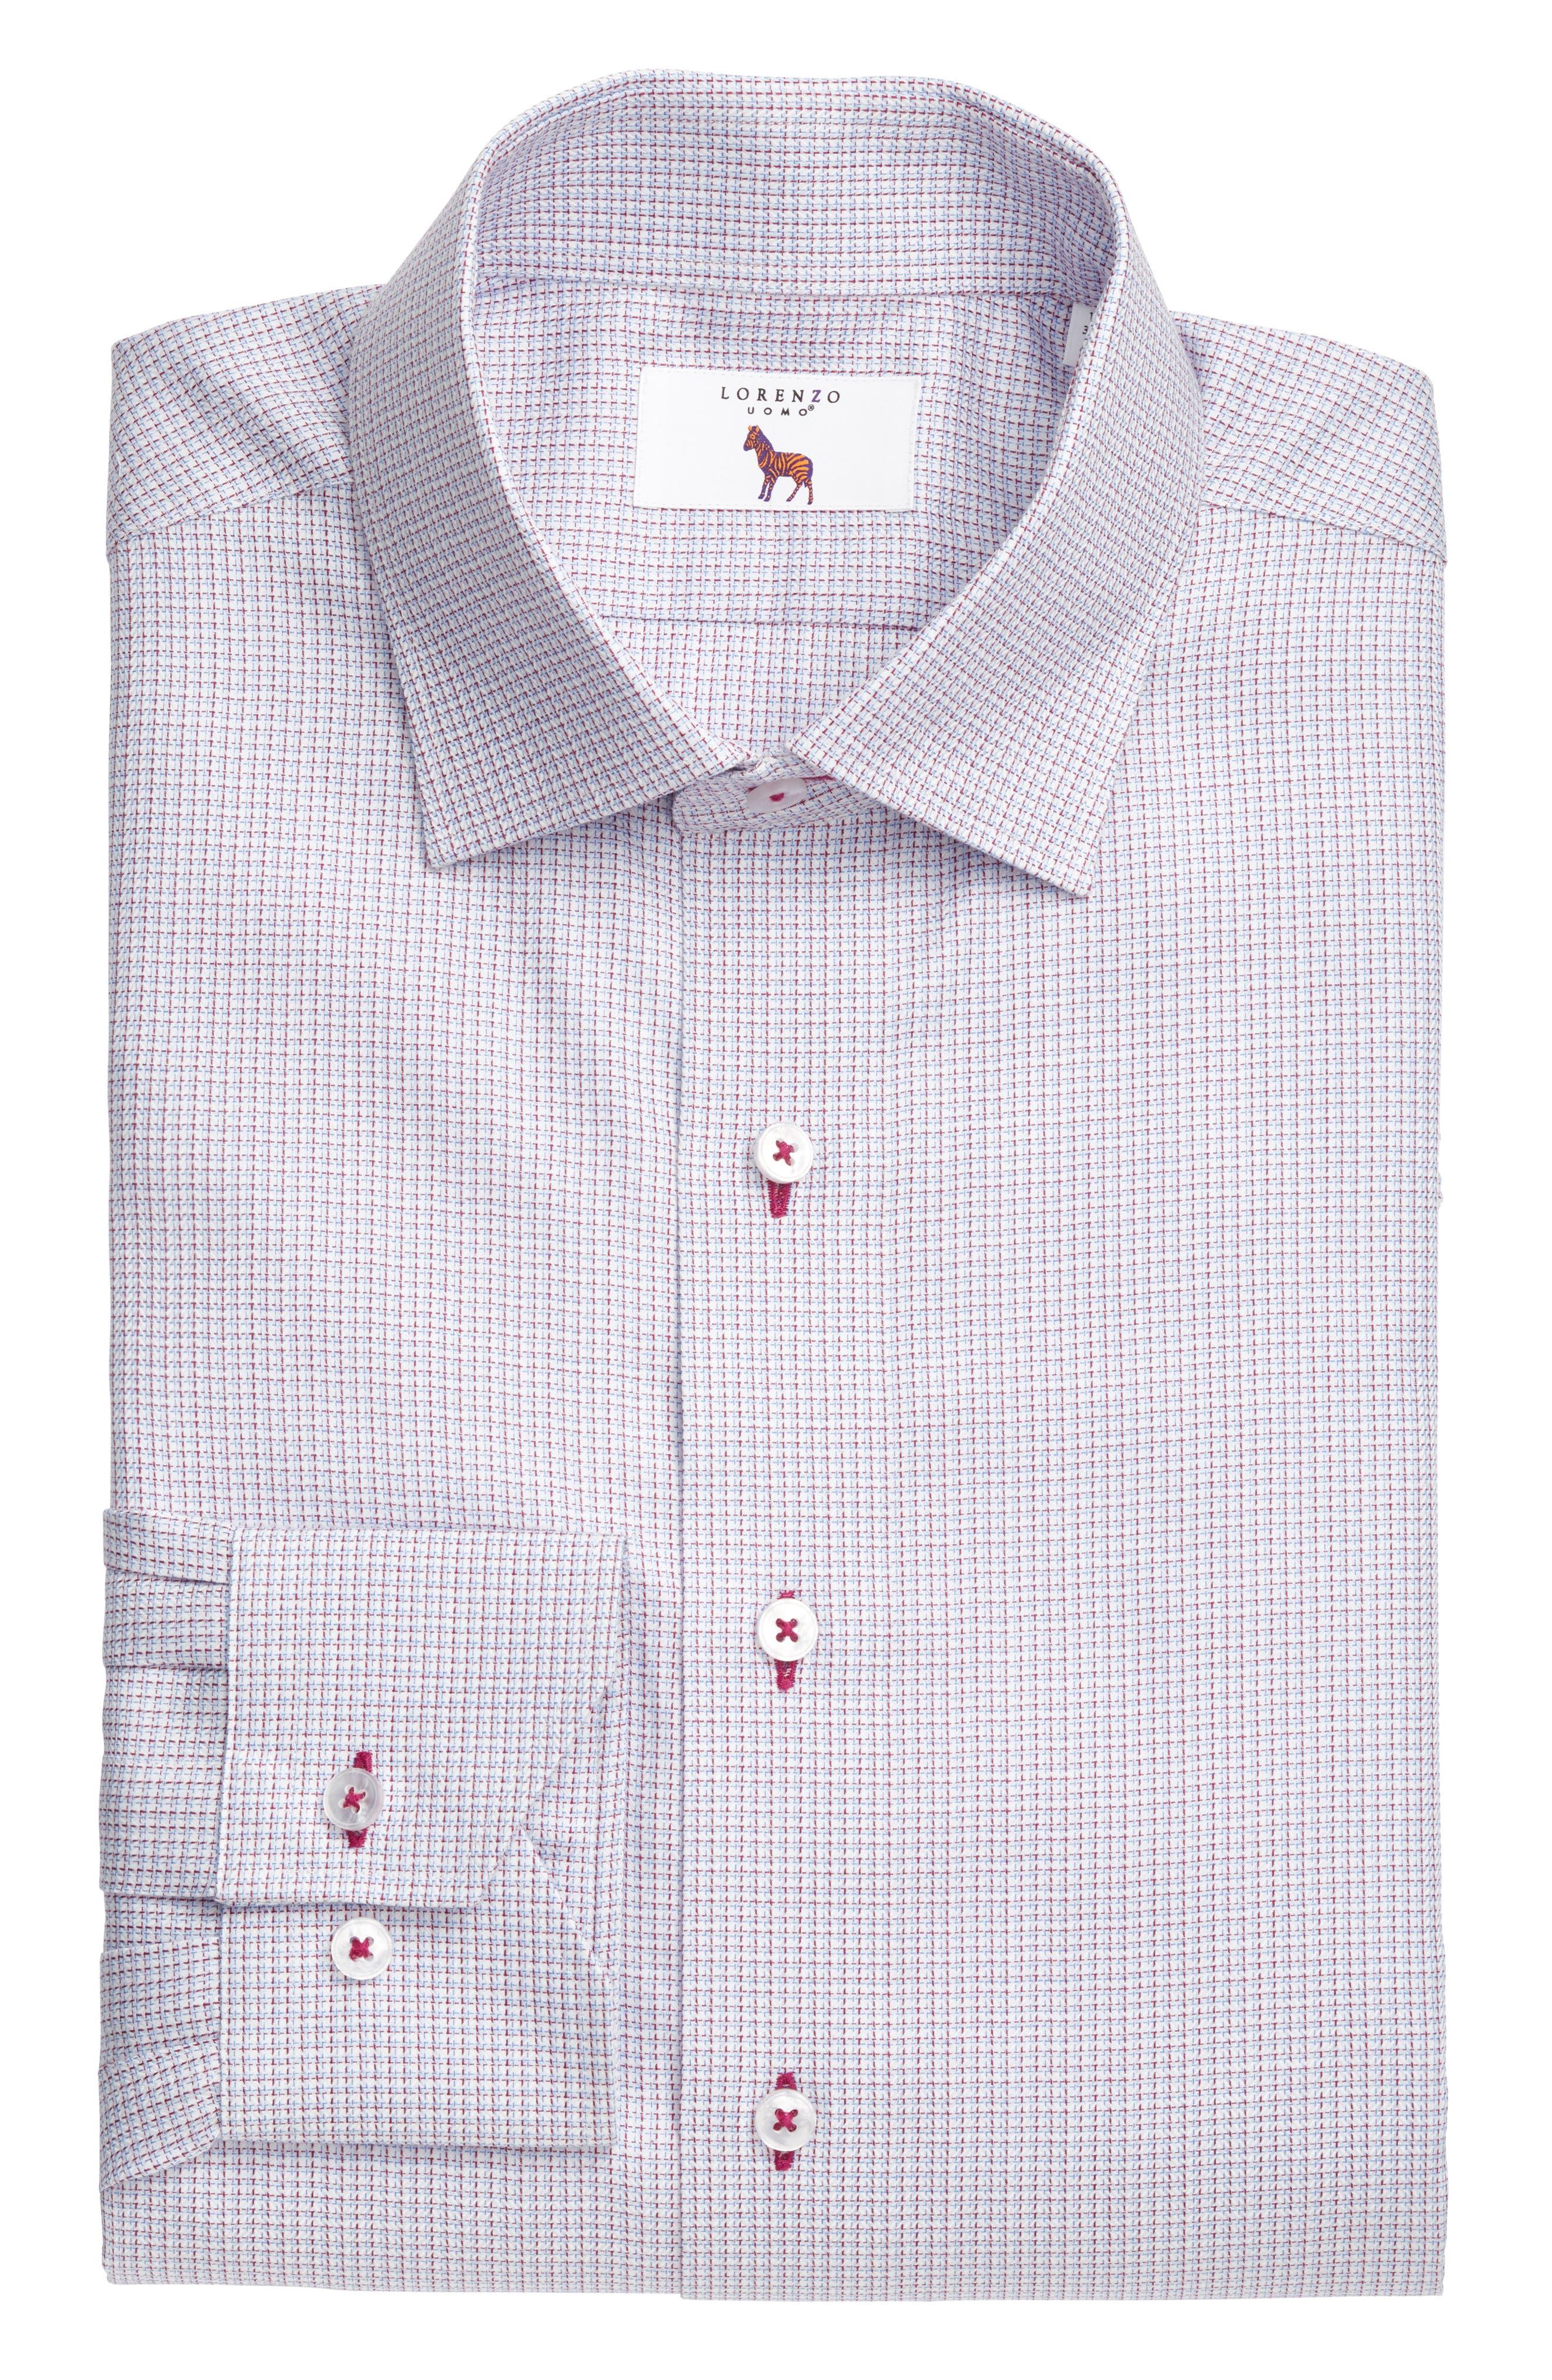 Trim Fit Textured Check Dress Shirt,                             Alternate thumbnail 3, color,                             450